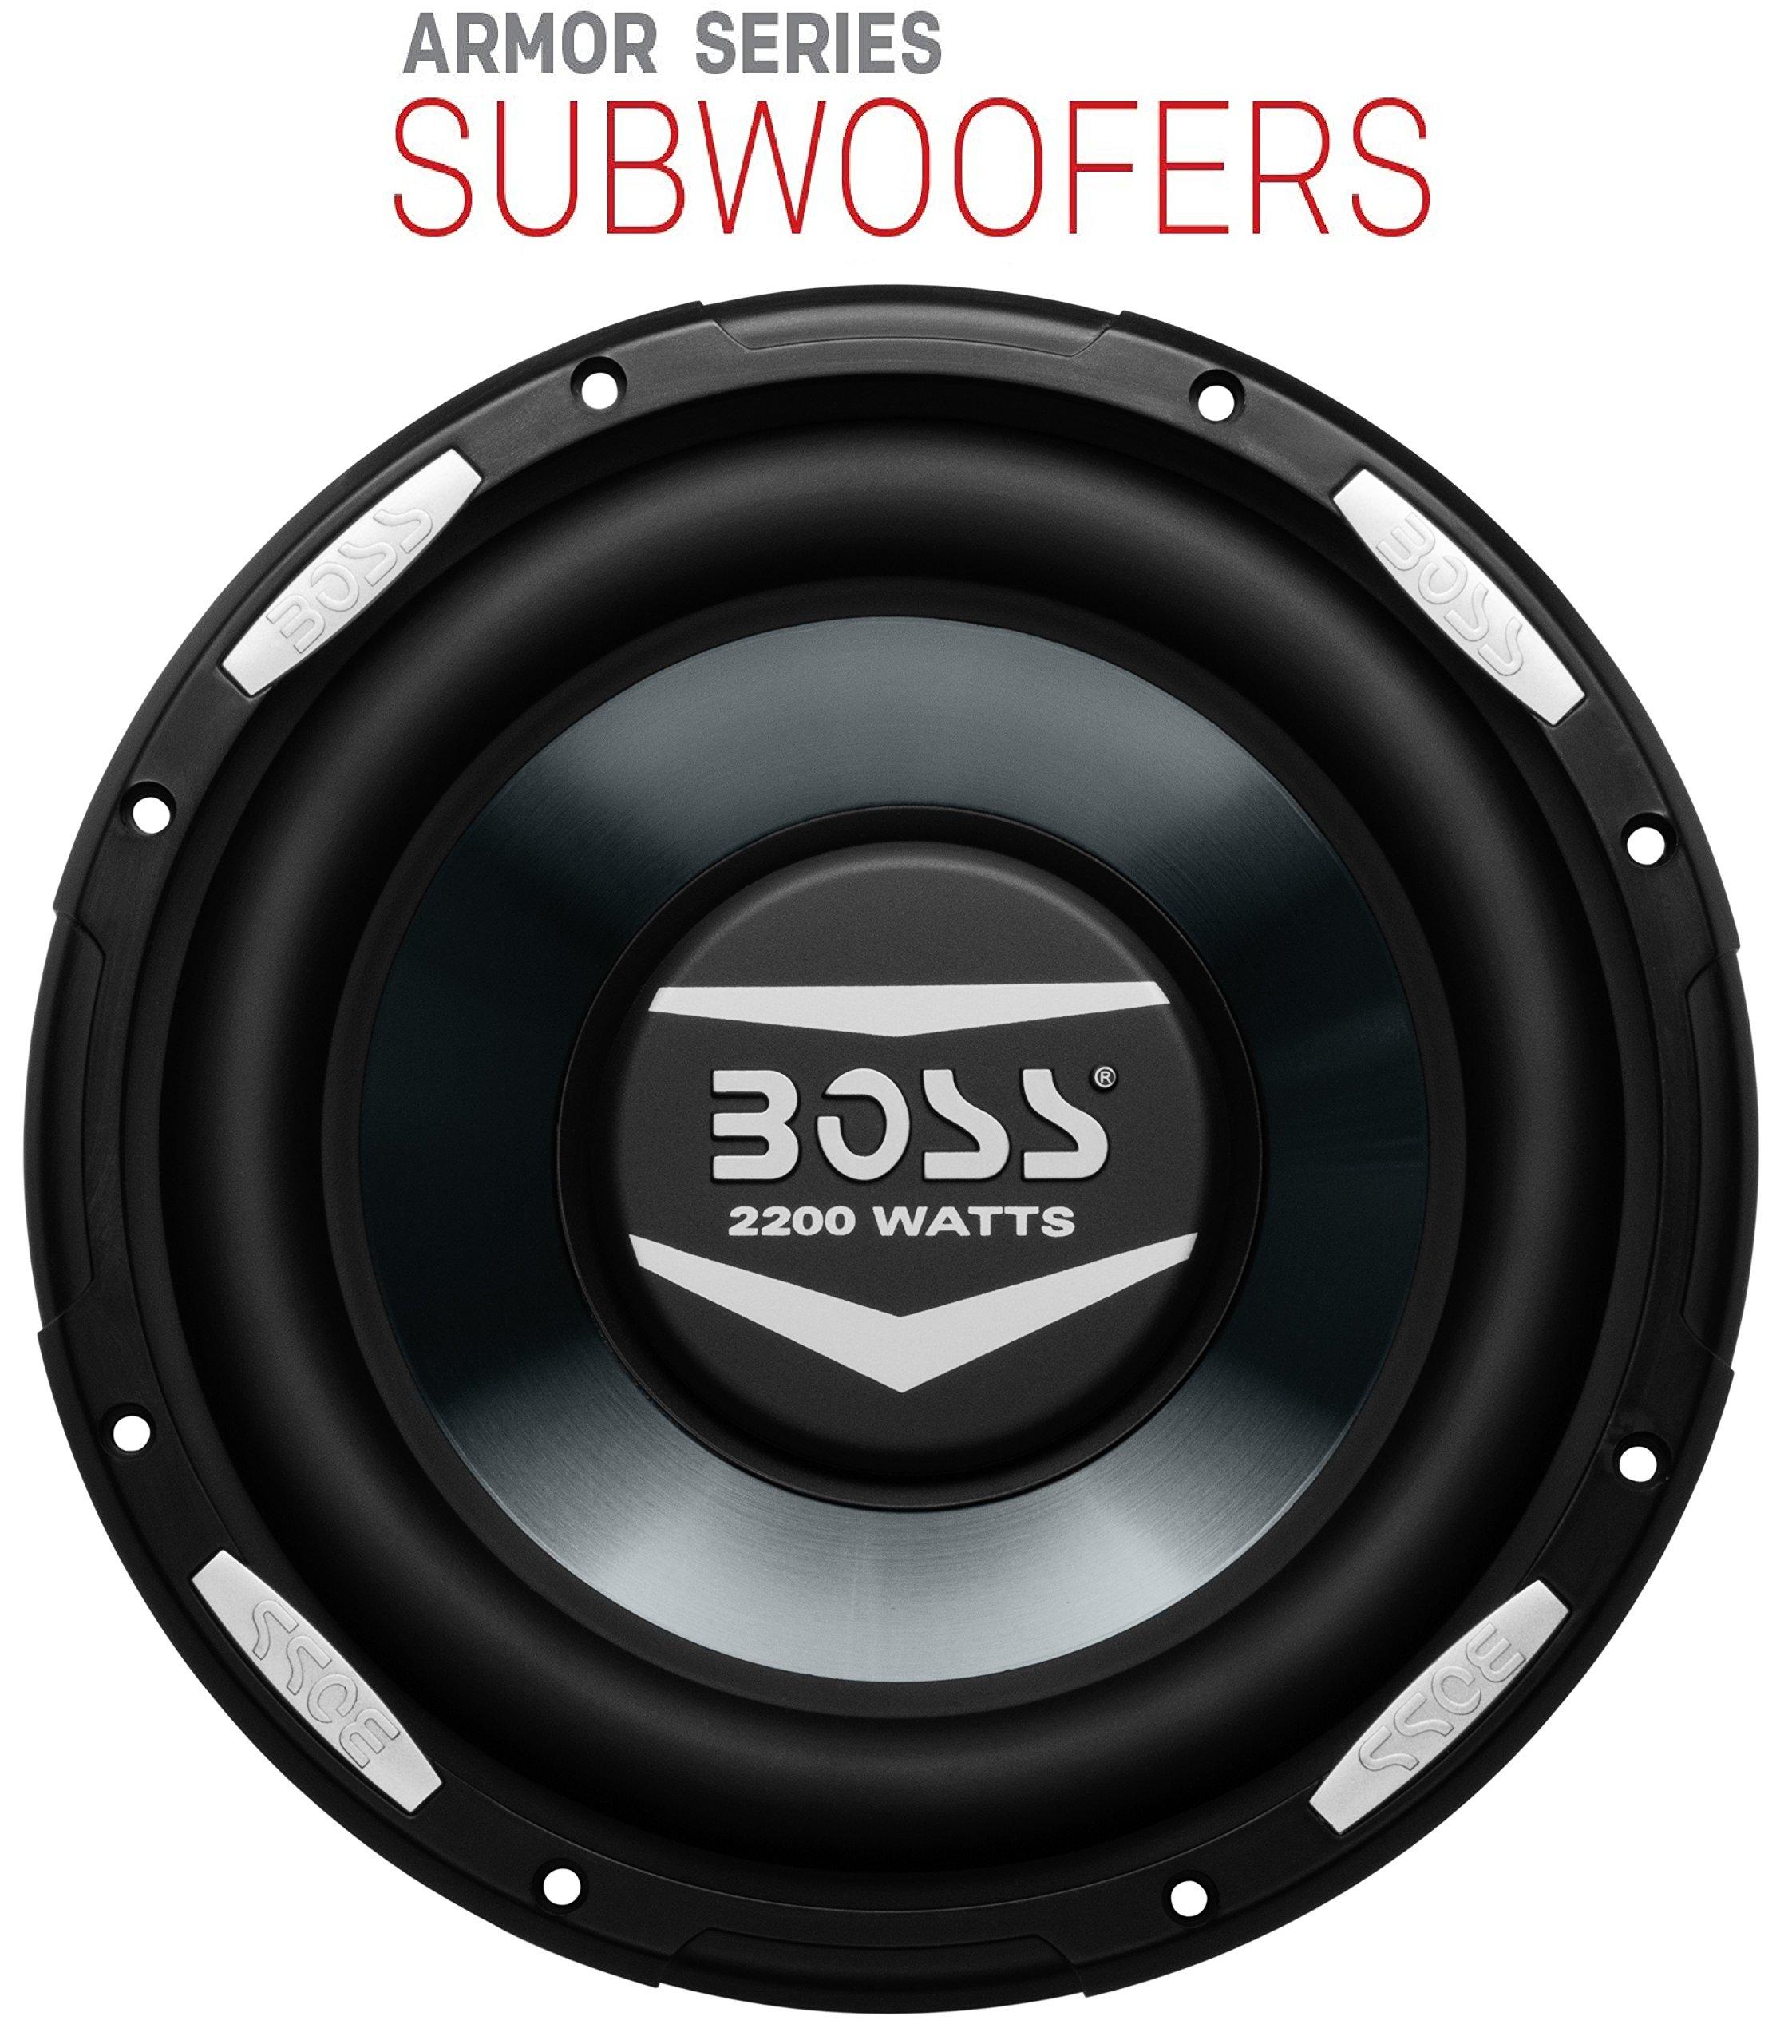 BOSS Audio AR10D 2000 Watt, 10 Inch, Dual 4 Ohm Voice Coil Car Subwoofer by BOSS Audio (Image #1)